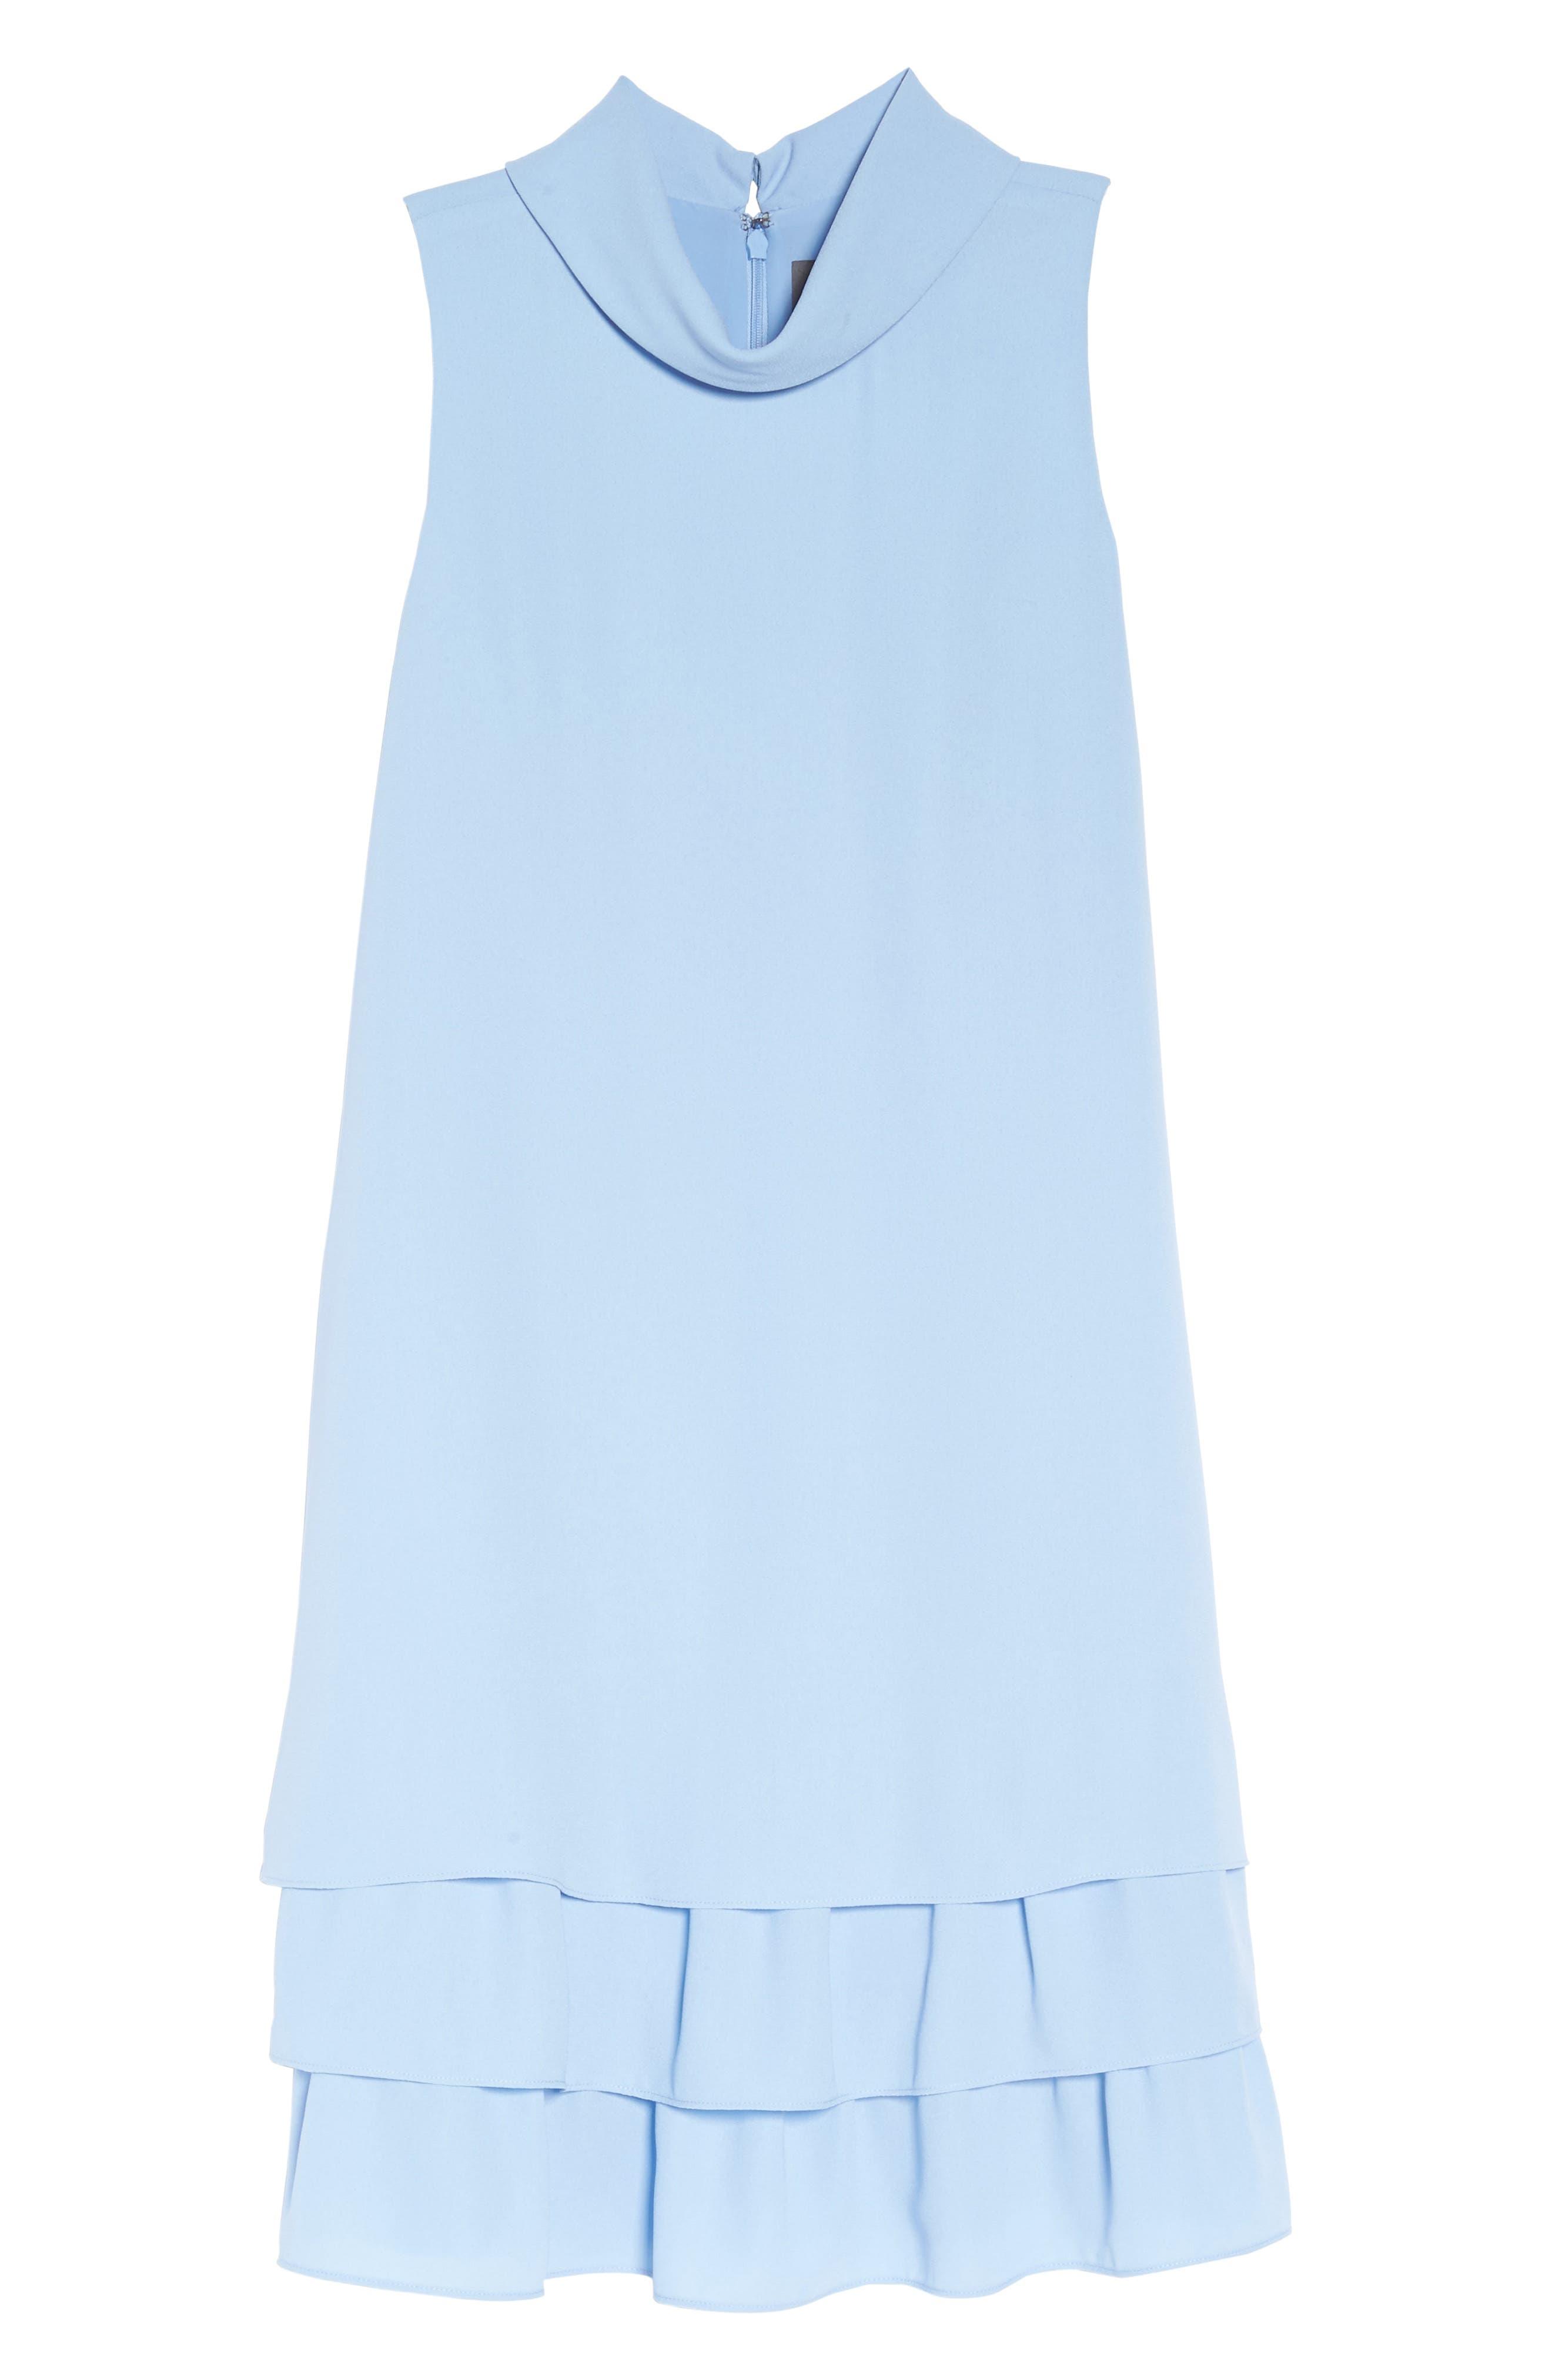 Moss Crepe Roll Neck Ruffle Dress,                             Alternate thumbnail 6, color,                             452